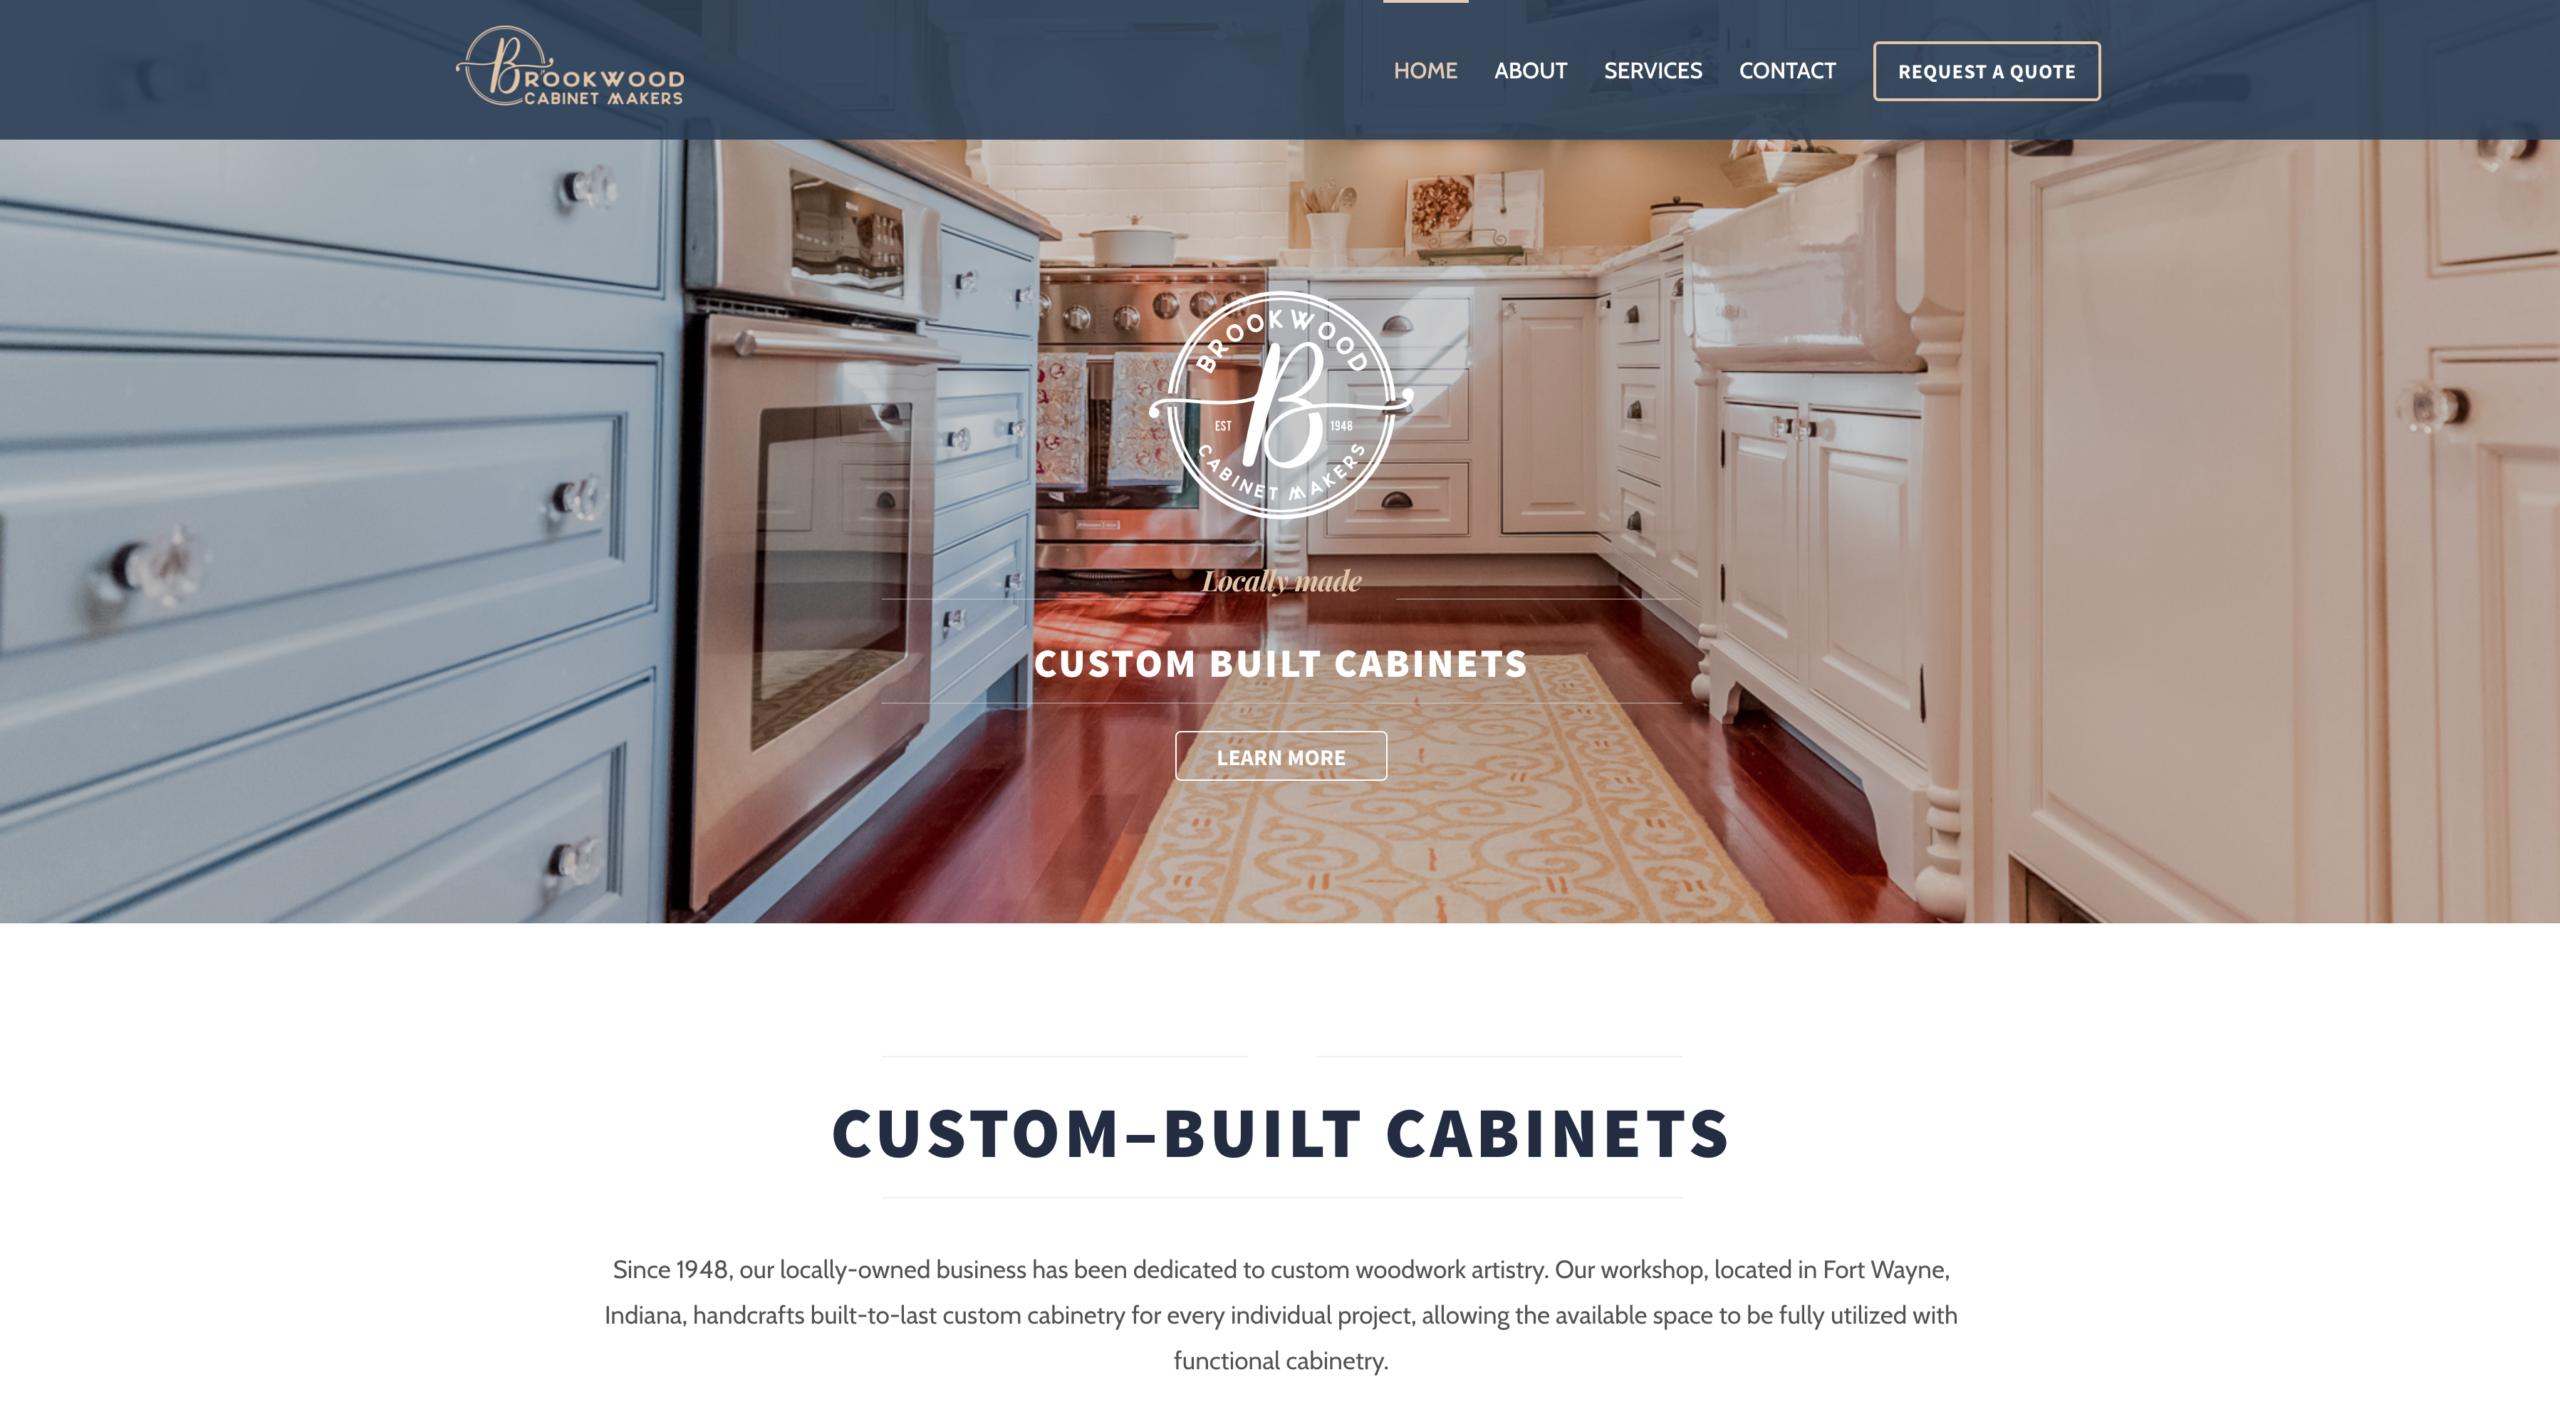 dustin-keeslar-portfolio-website-brookwood-cabinet-company2